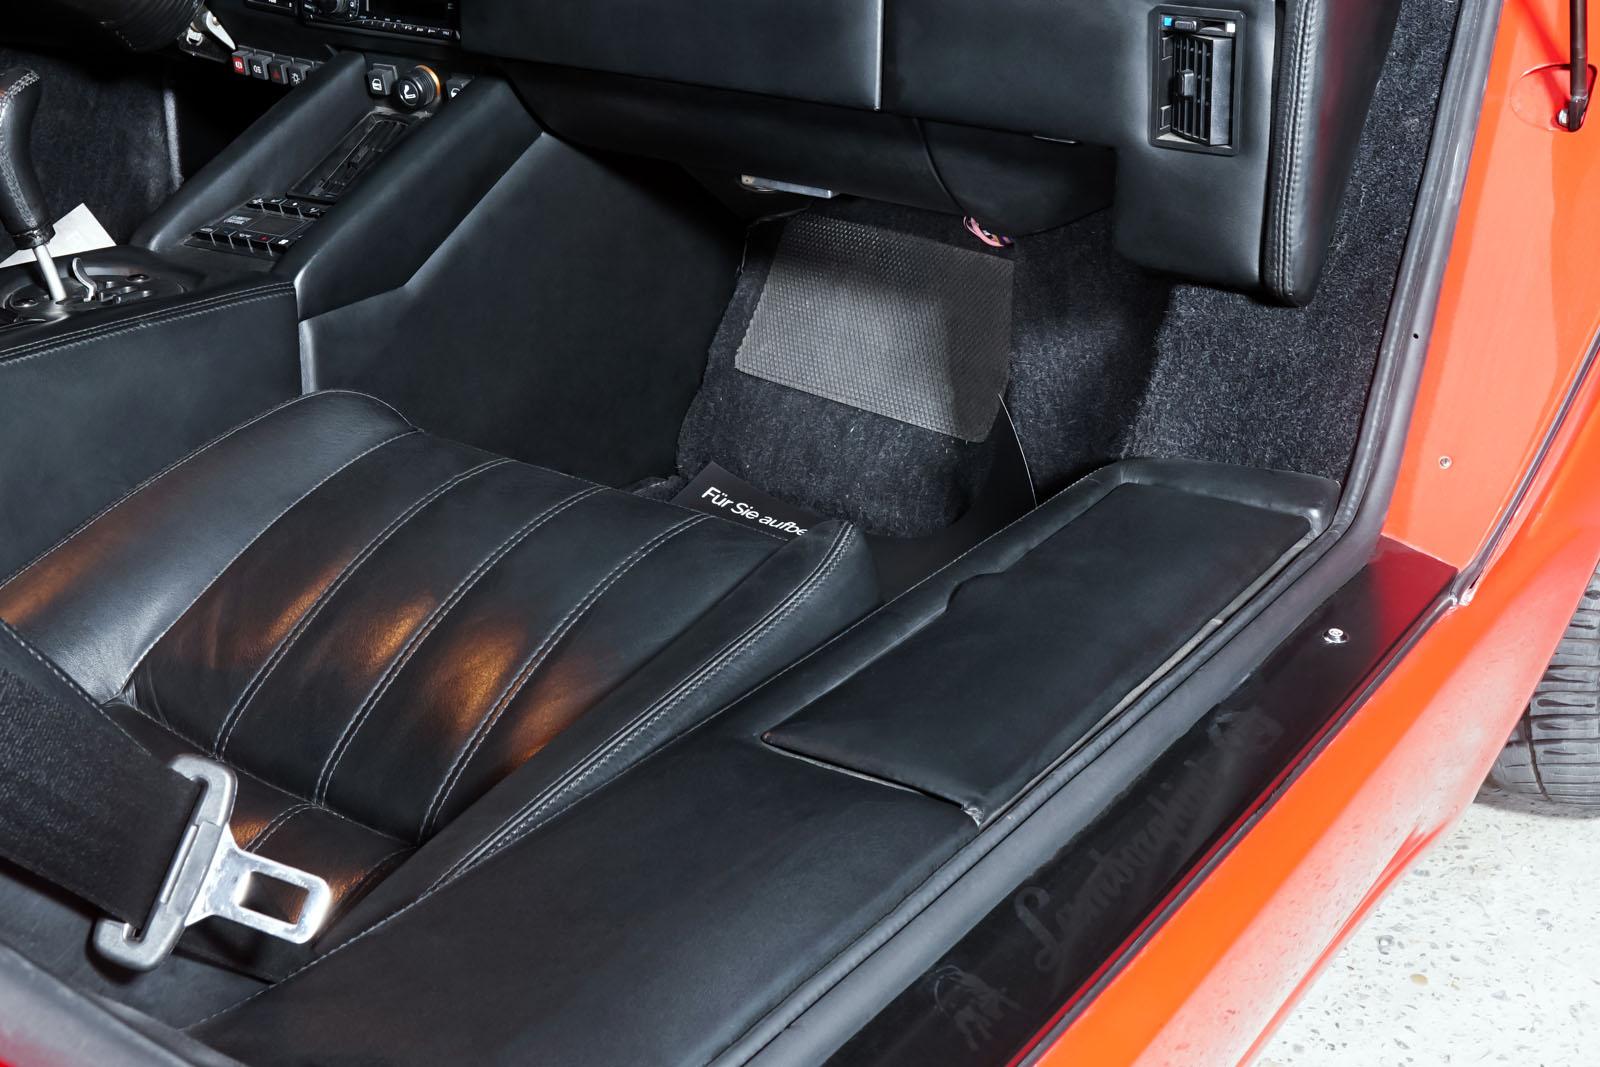 Lamborghini_Countach_Rot_Schwarz_LAM-2811_18_w